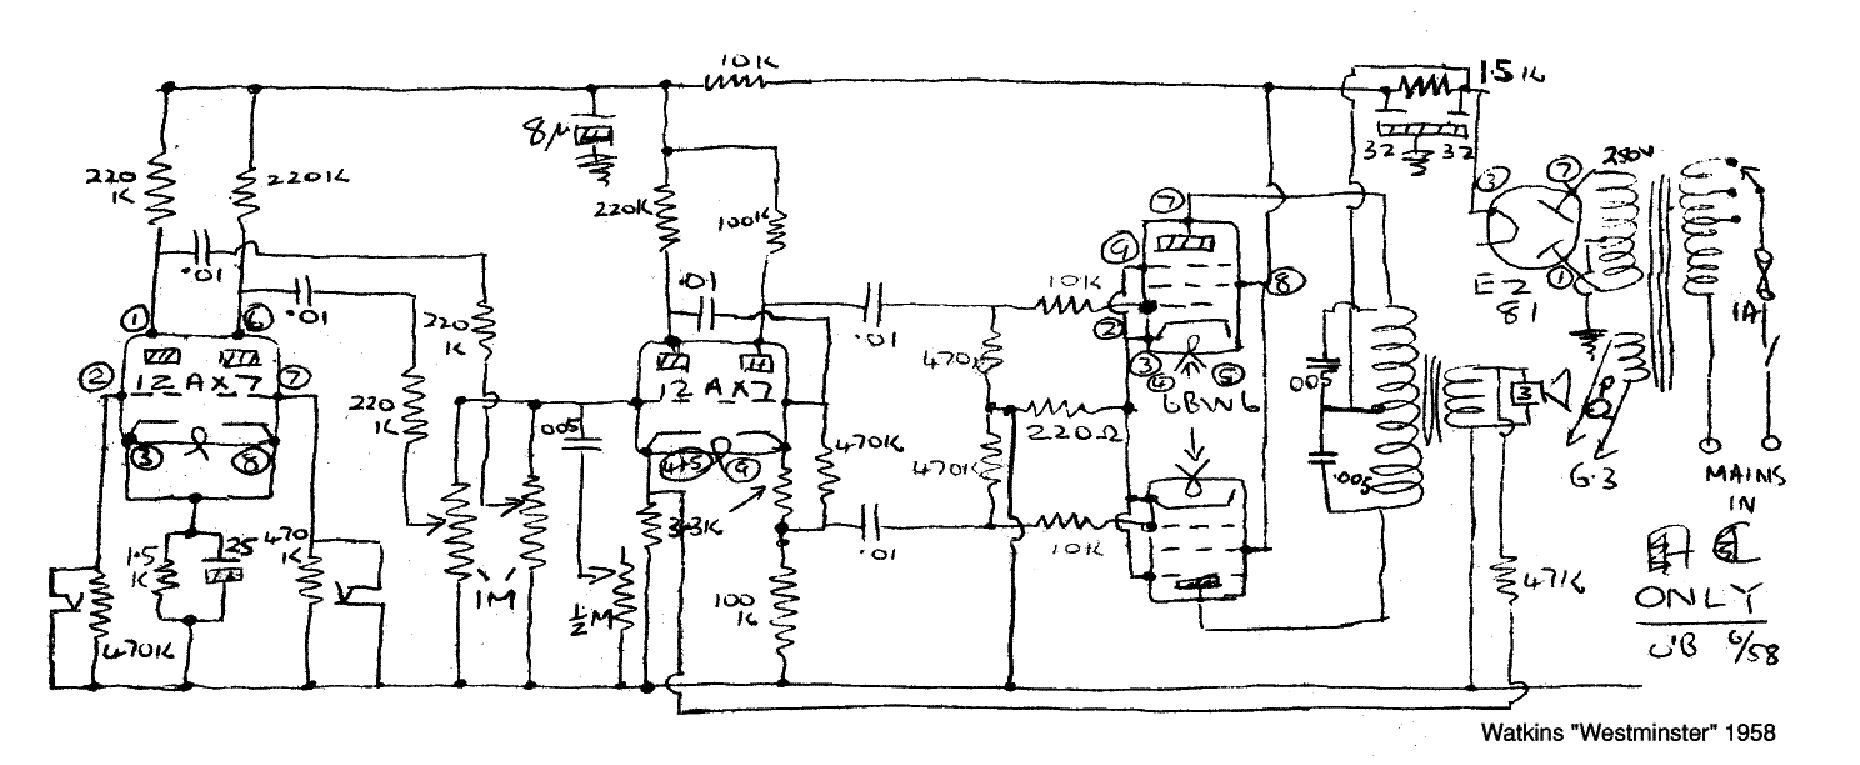 watkins westminster schematic    elektrotanya.com